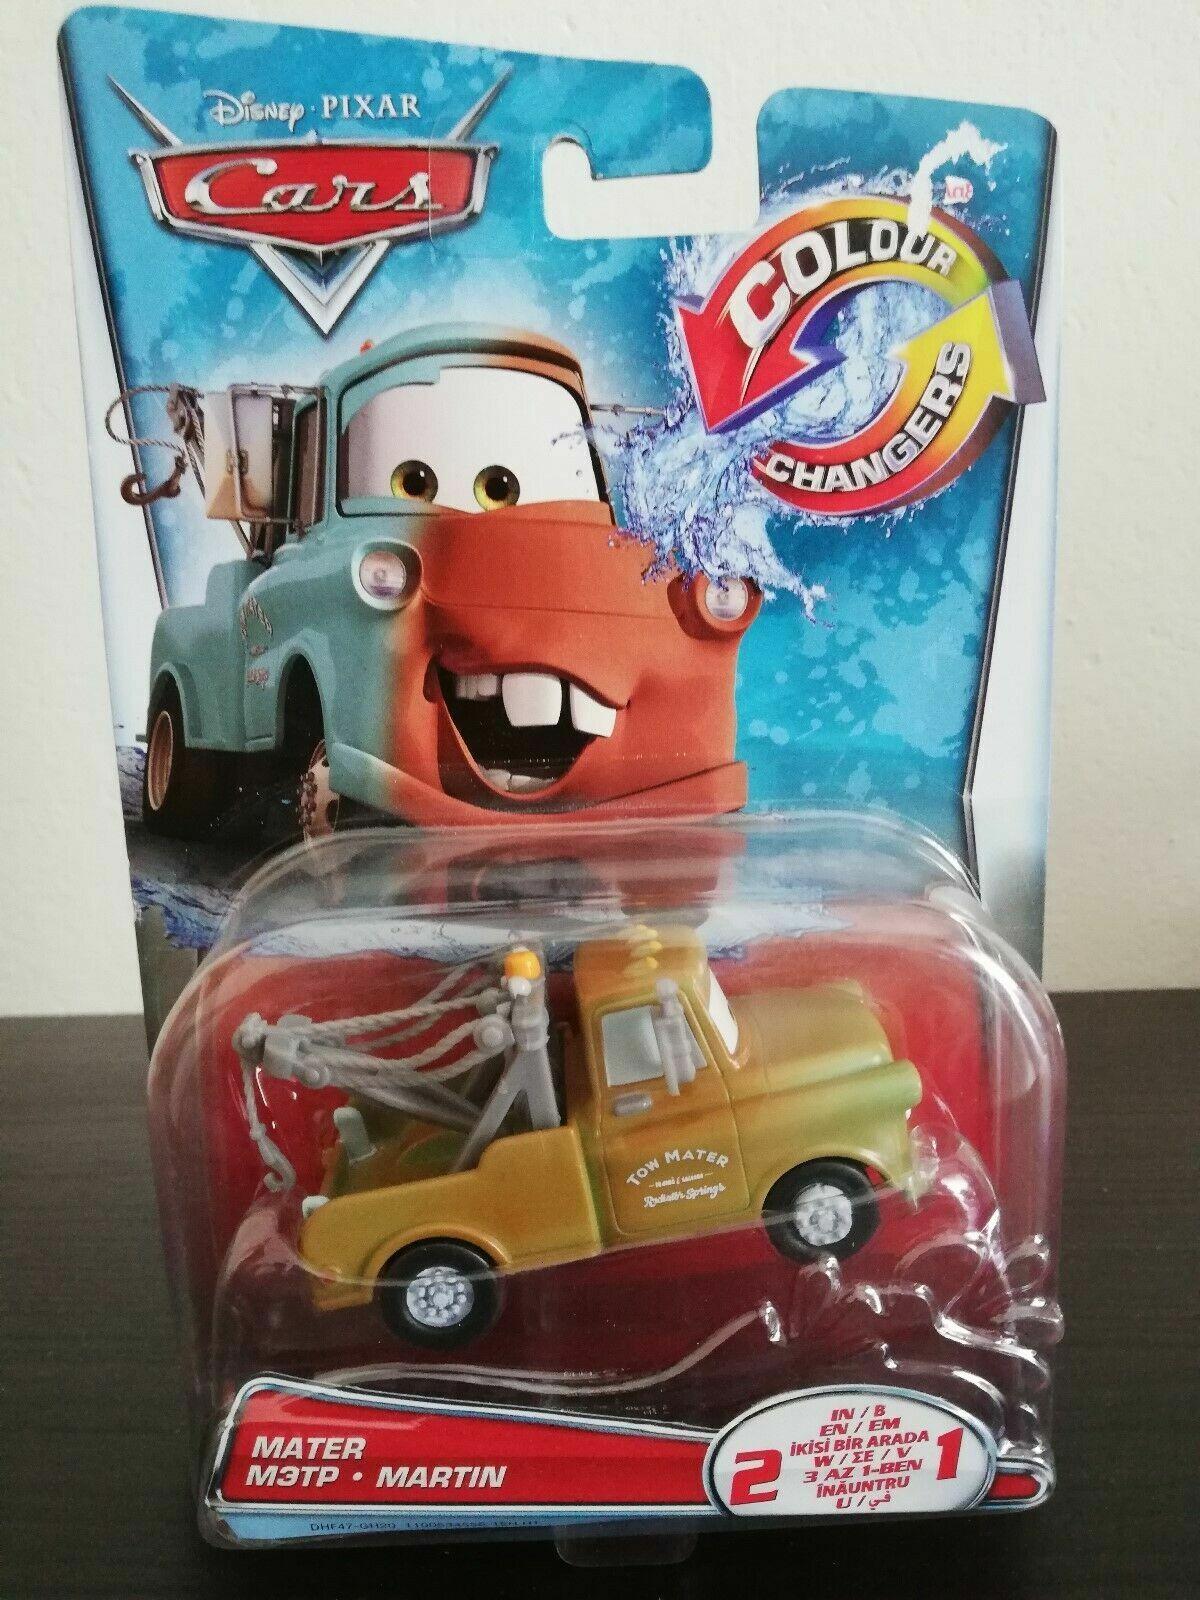 Pixar Disney Cars 1:55 Scale Color Changers Mater